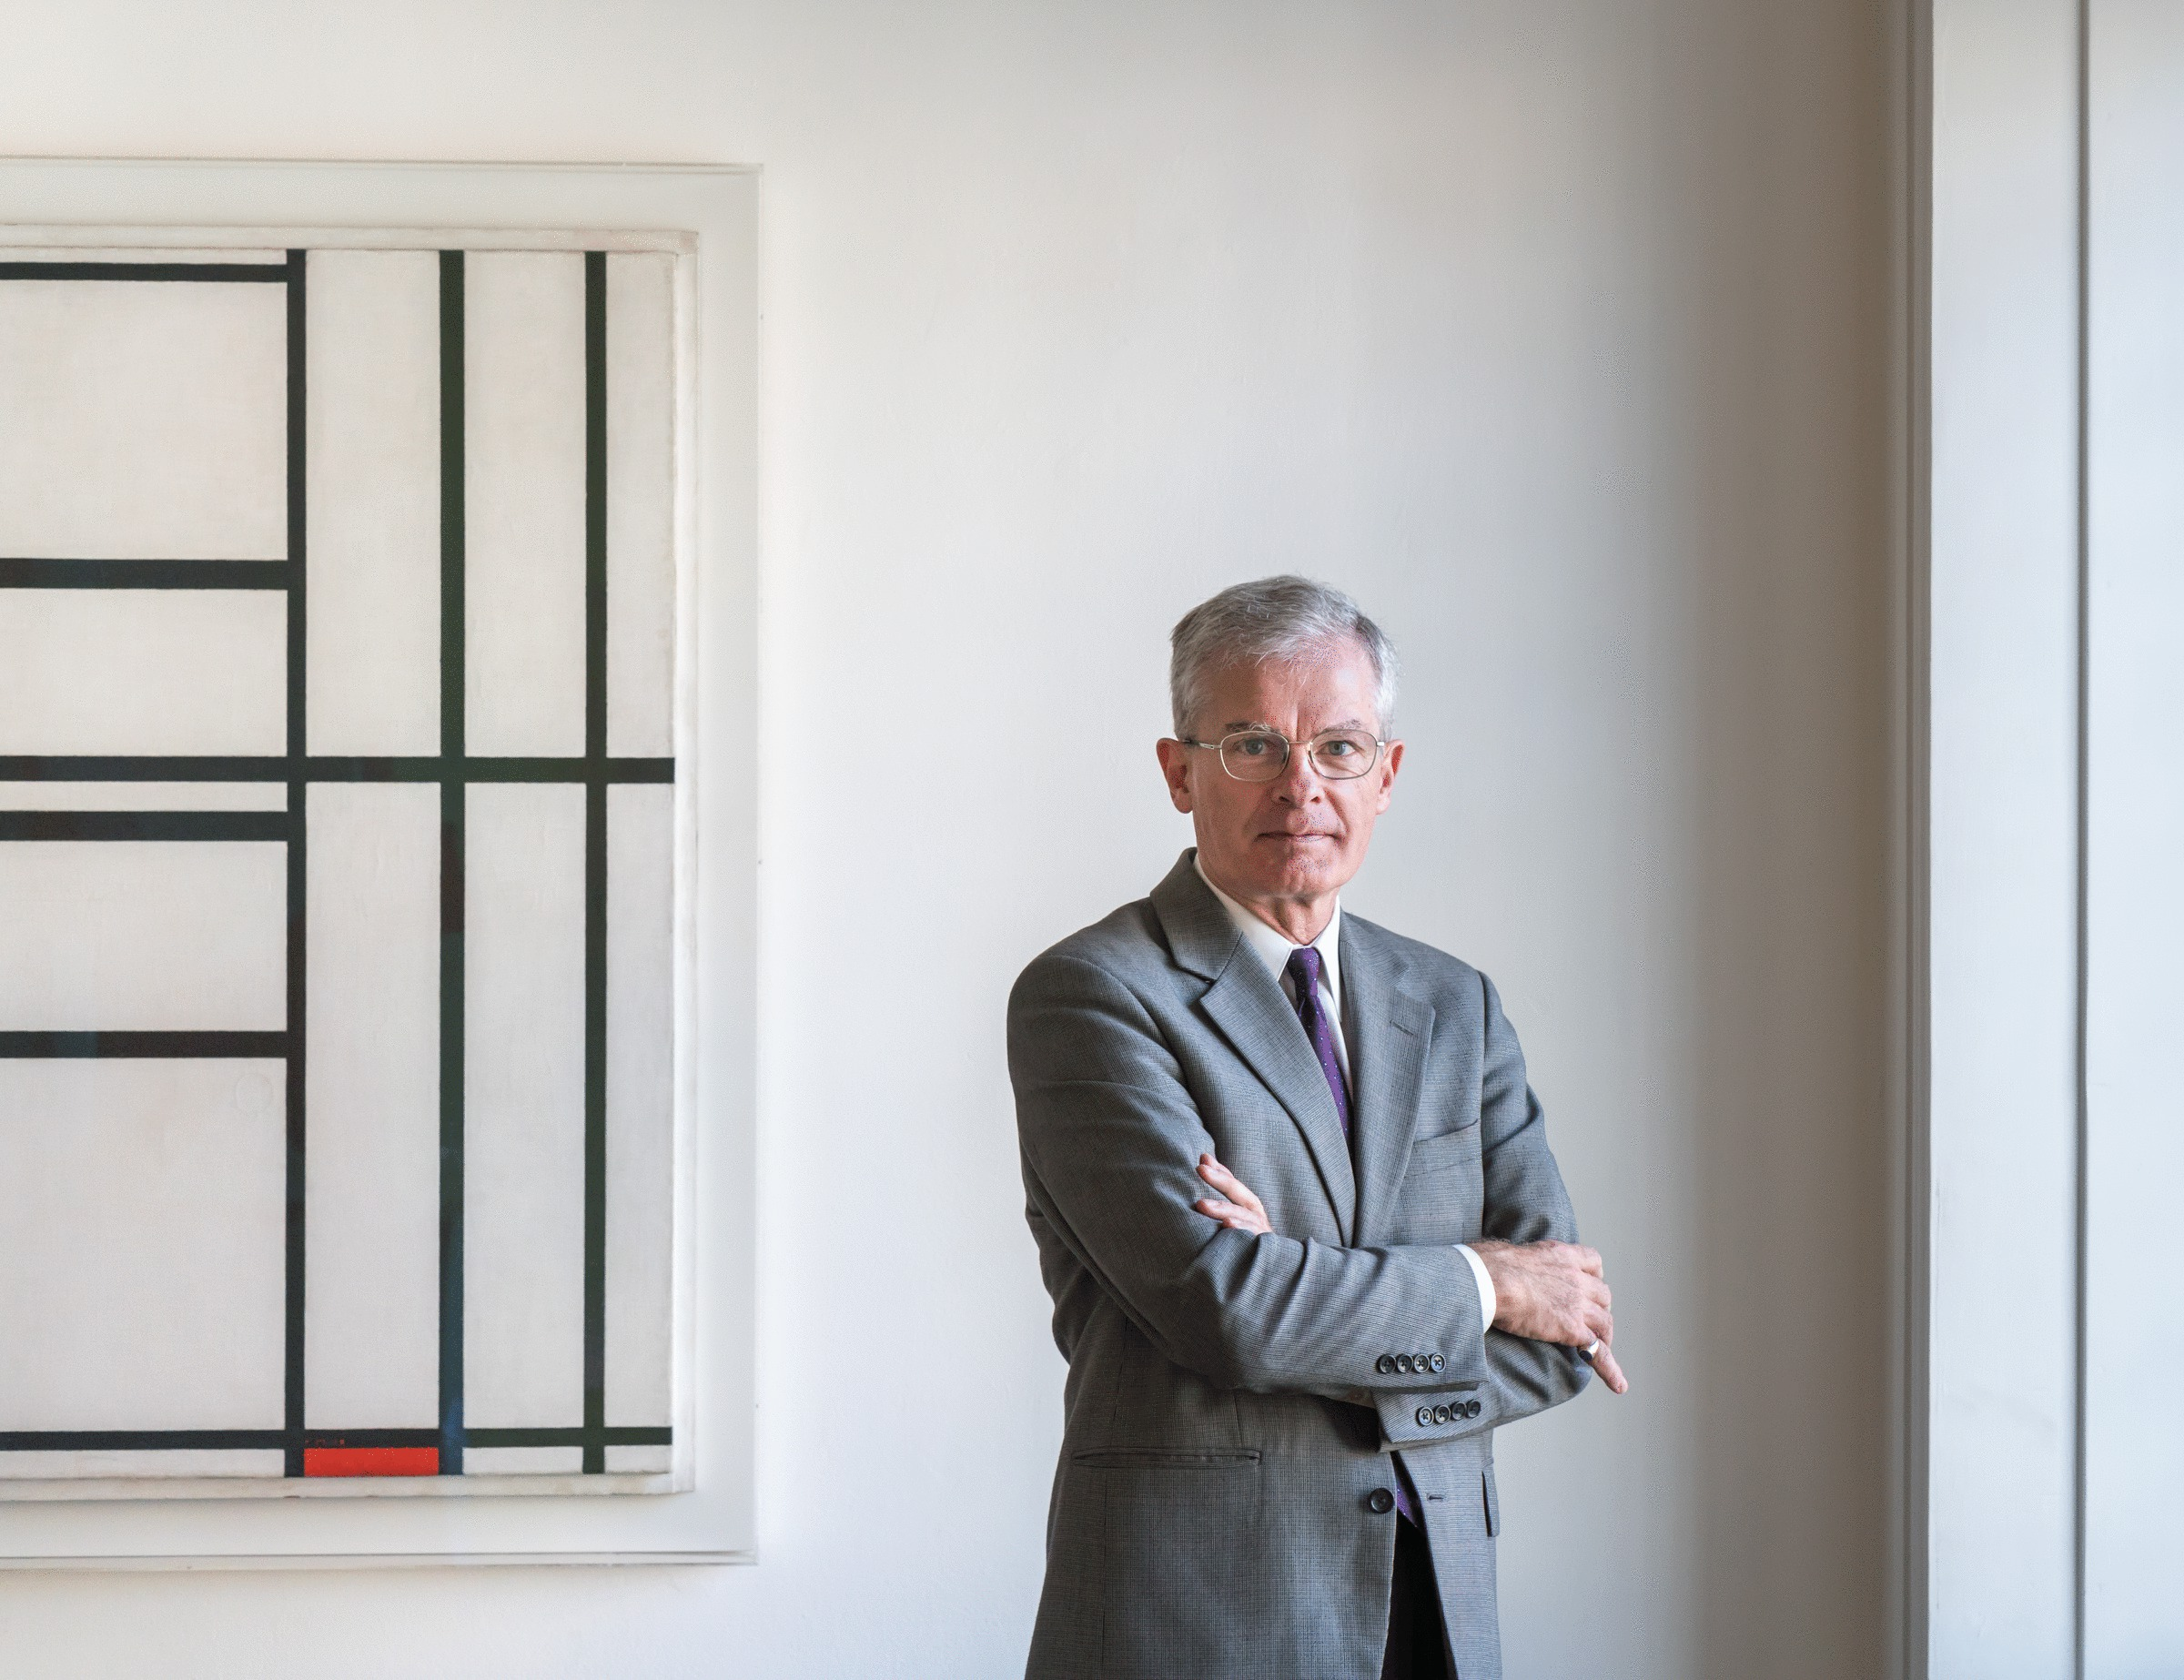 Philip Rylands for the Guggenheim 2016